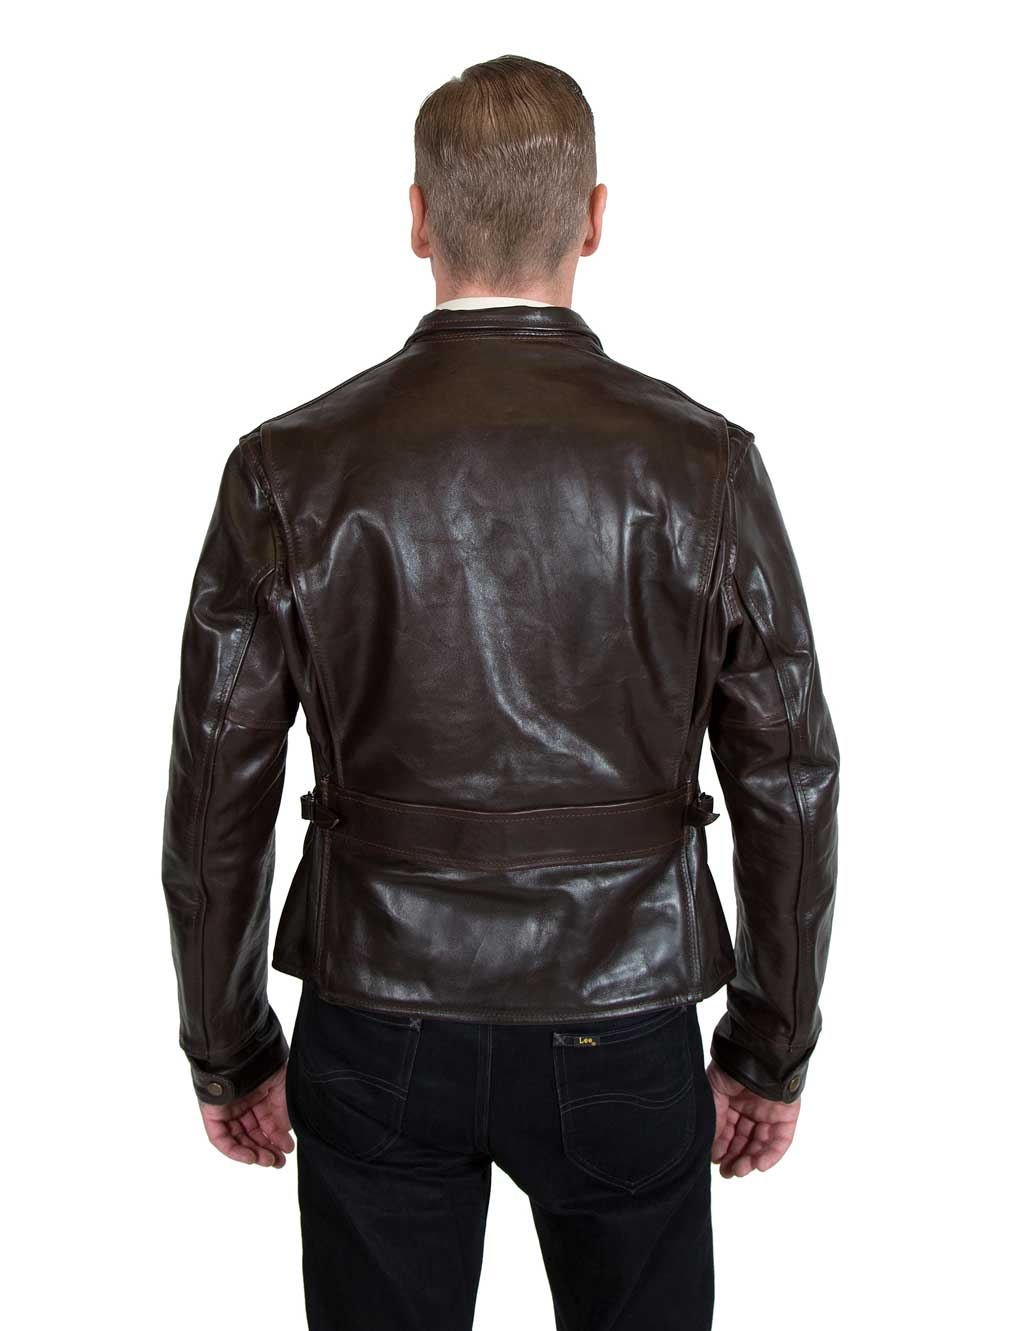 9701da537b3 Simmons Bilt - The Clayton Leather Jacket